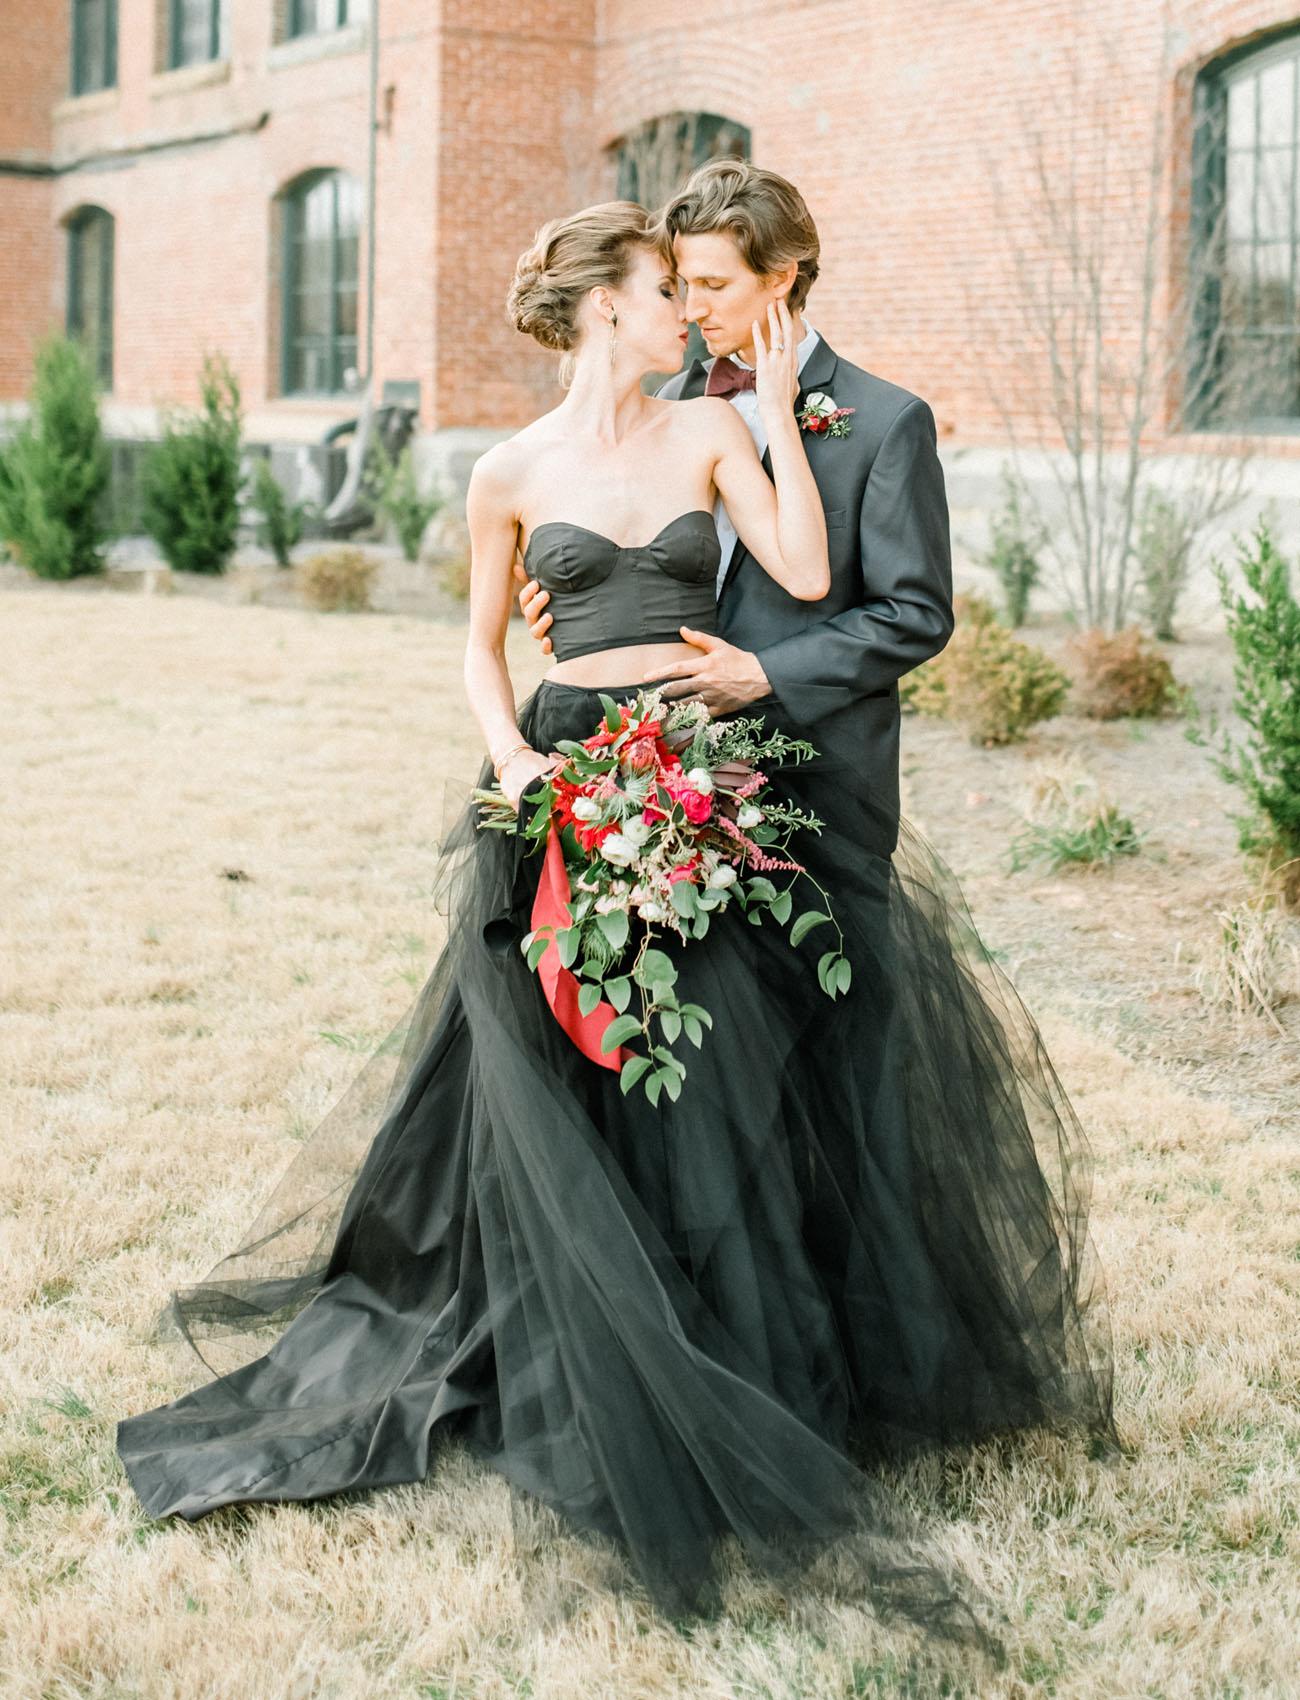 23 Romantic And Stylish Black Wedding Dresses Chicwedd,Wedding Dresses Nordstrom Sale